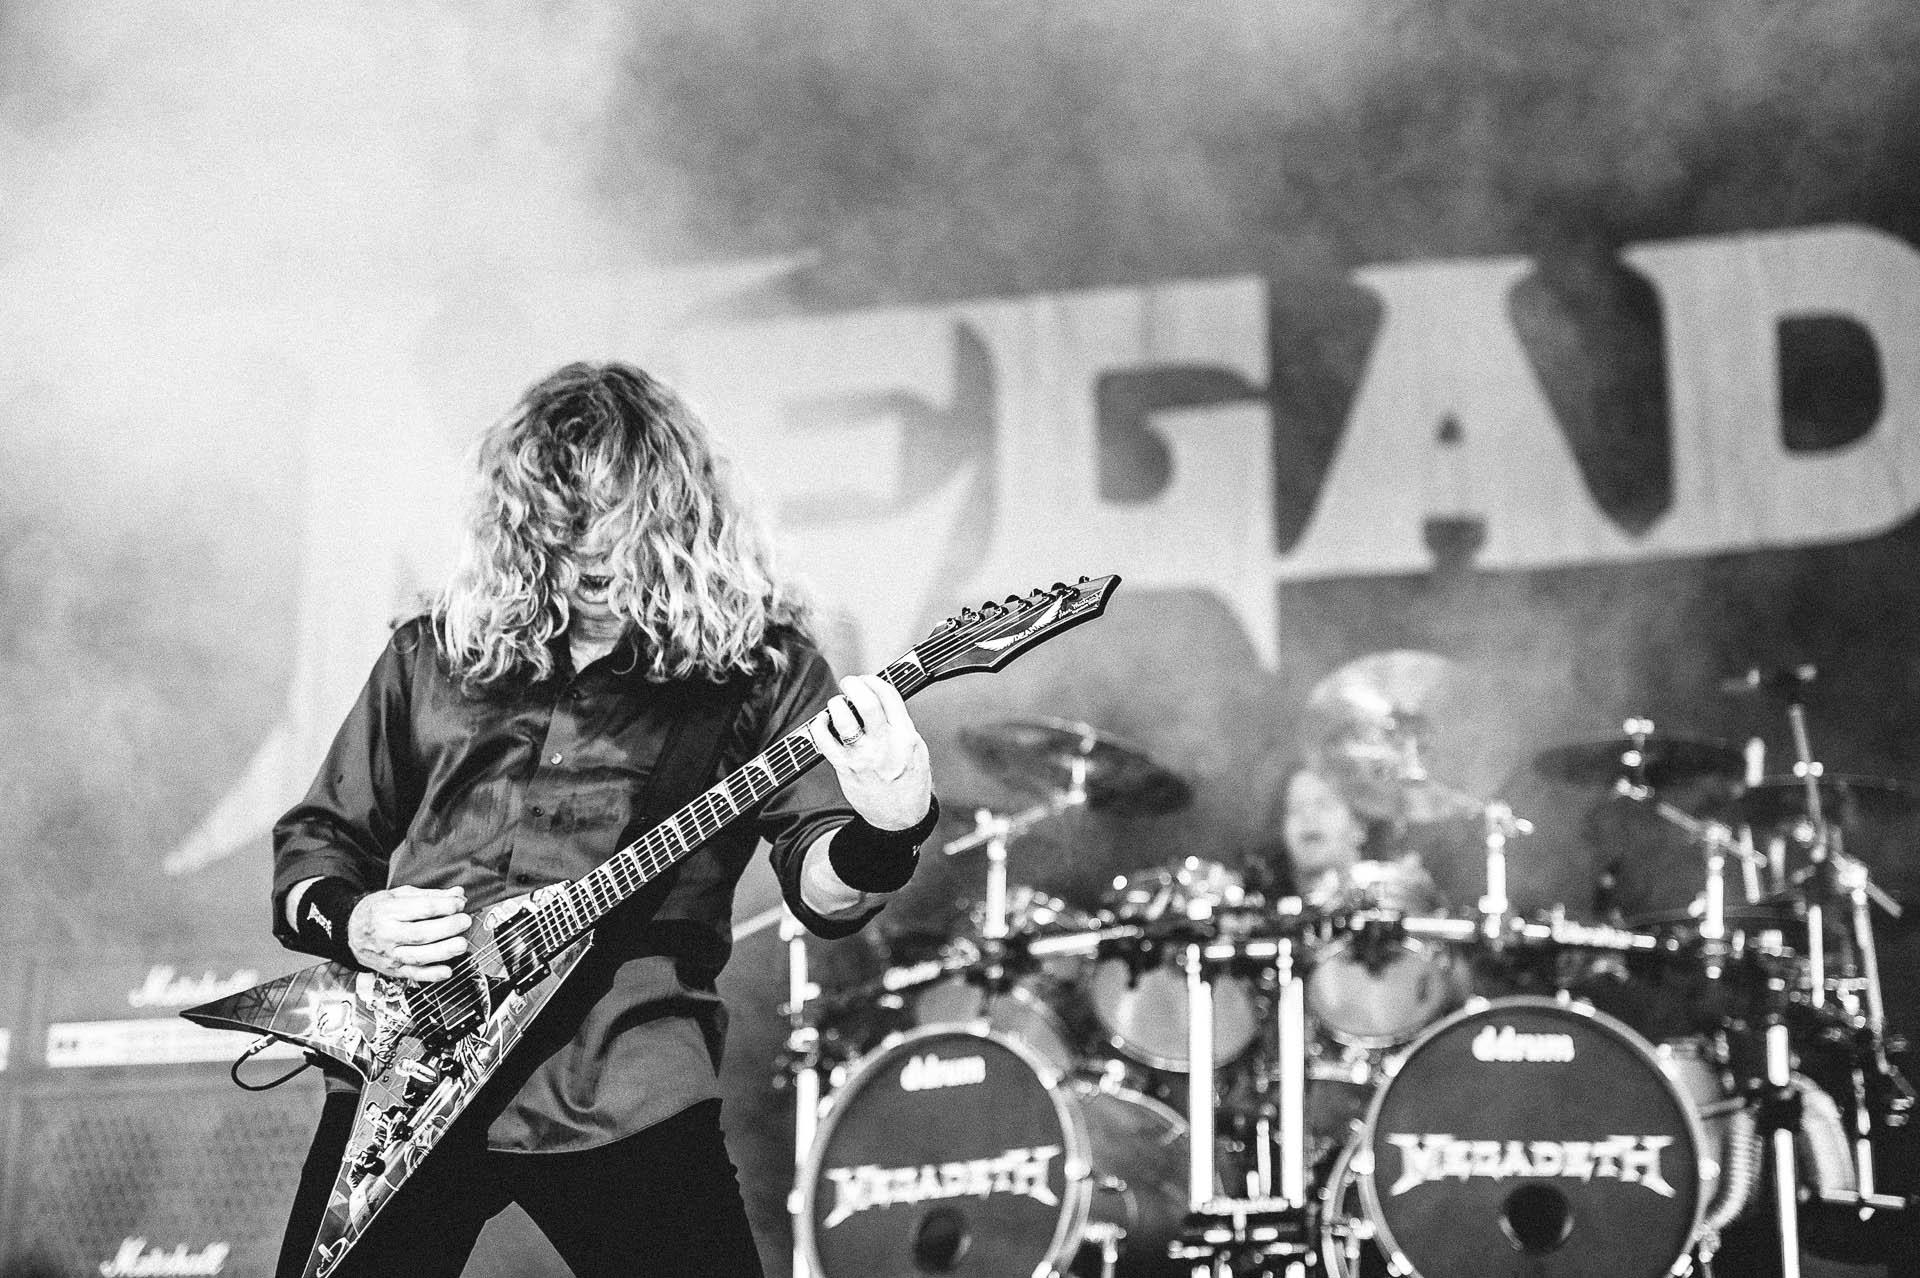 megadeth_x103_mayhem_festival_live_klipsch_music_center_indianapolis-23